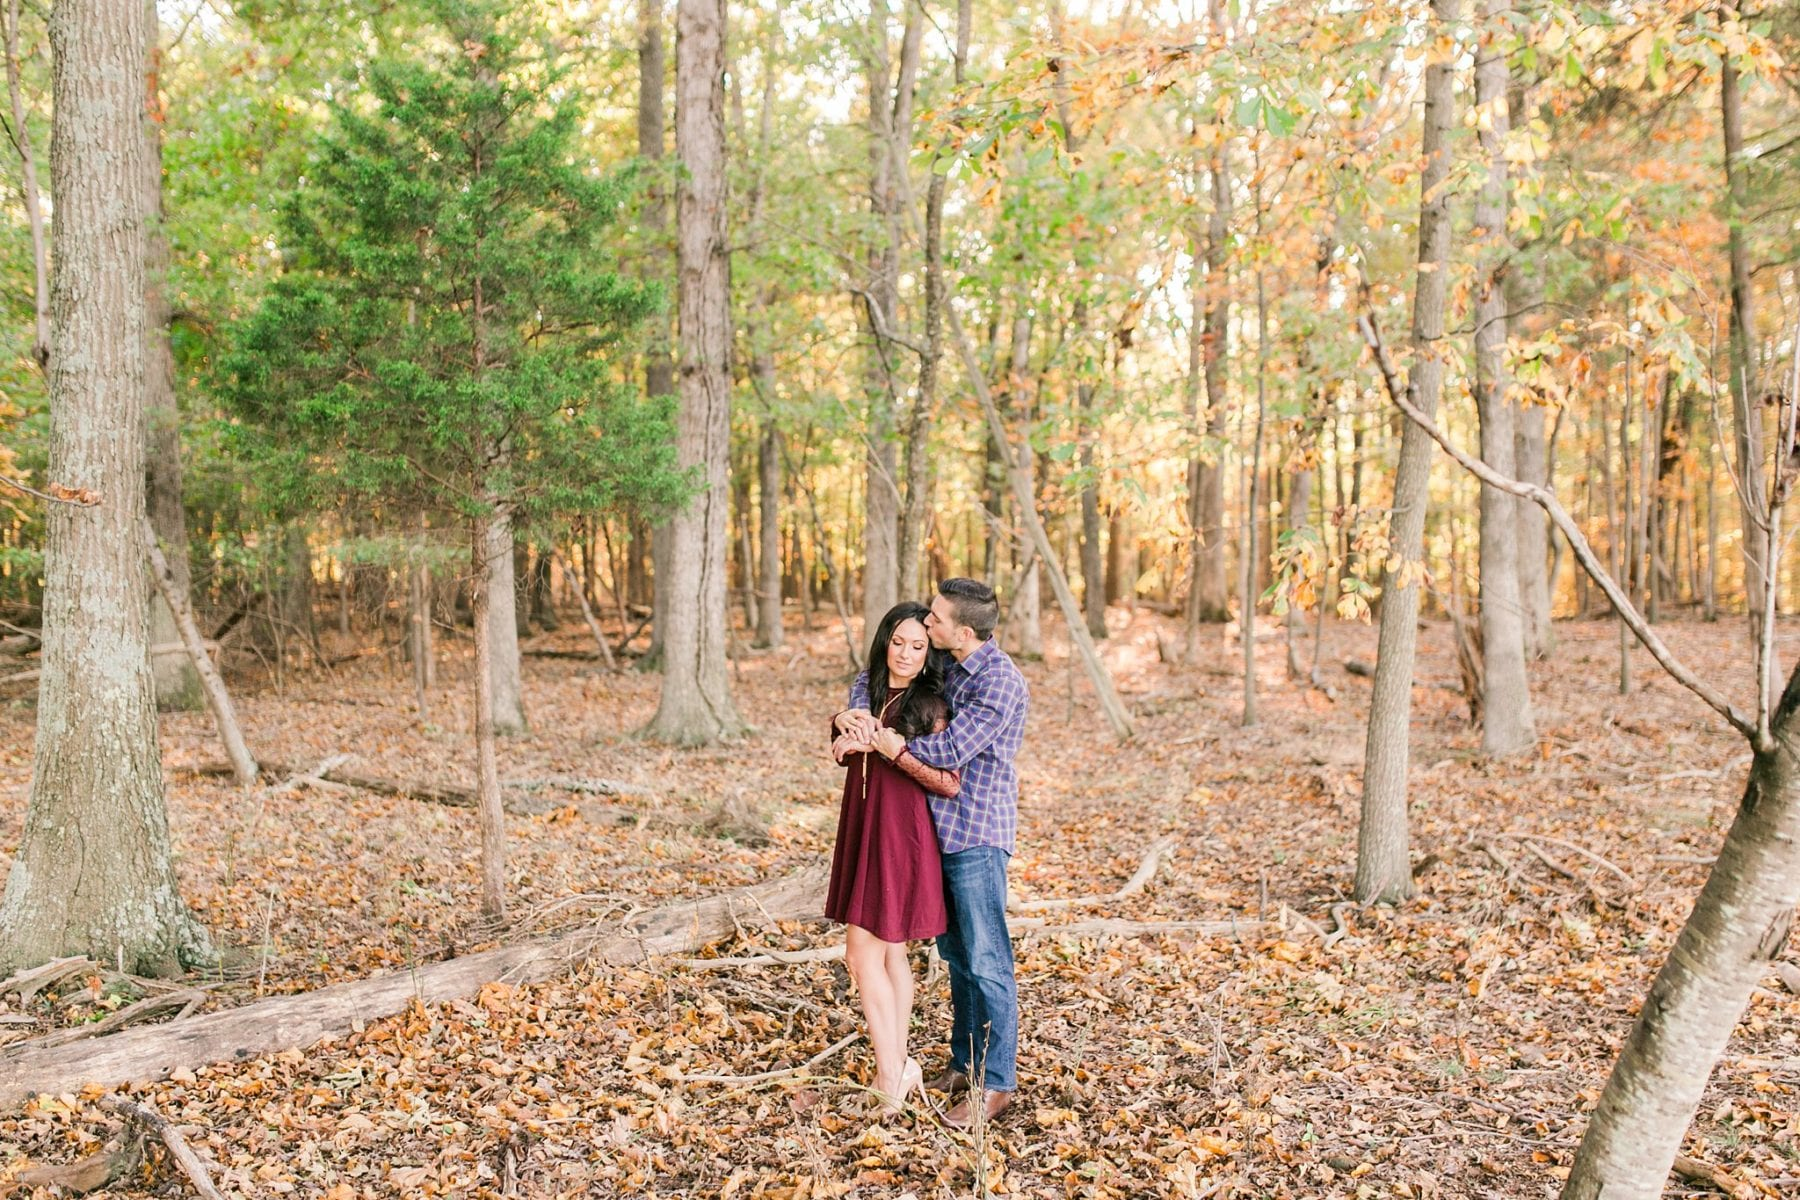 Manassas Battlefield Portraits Virginia Wedding Photographer Megan Kelsey Photography Lianne & Chris-58.jpg